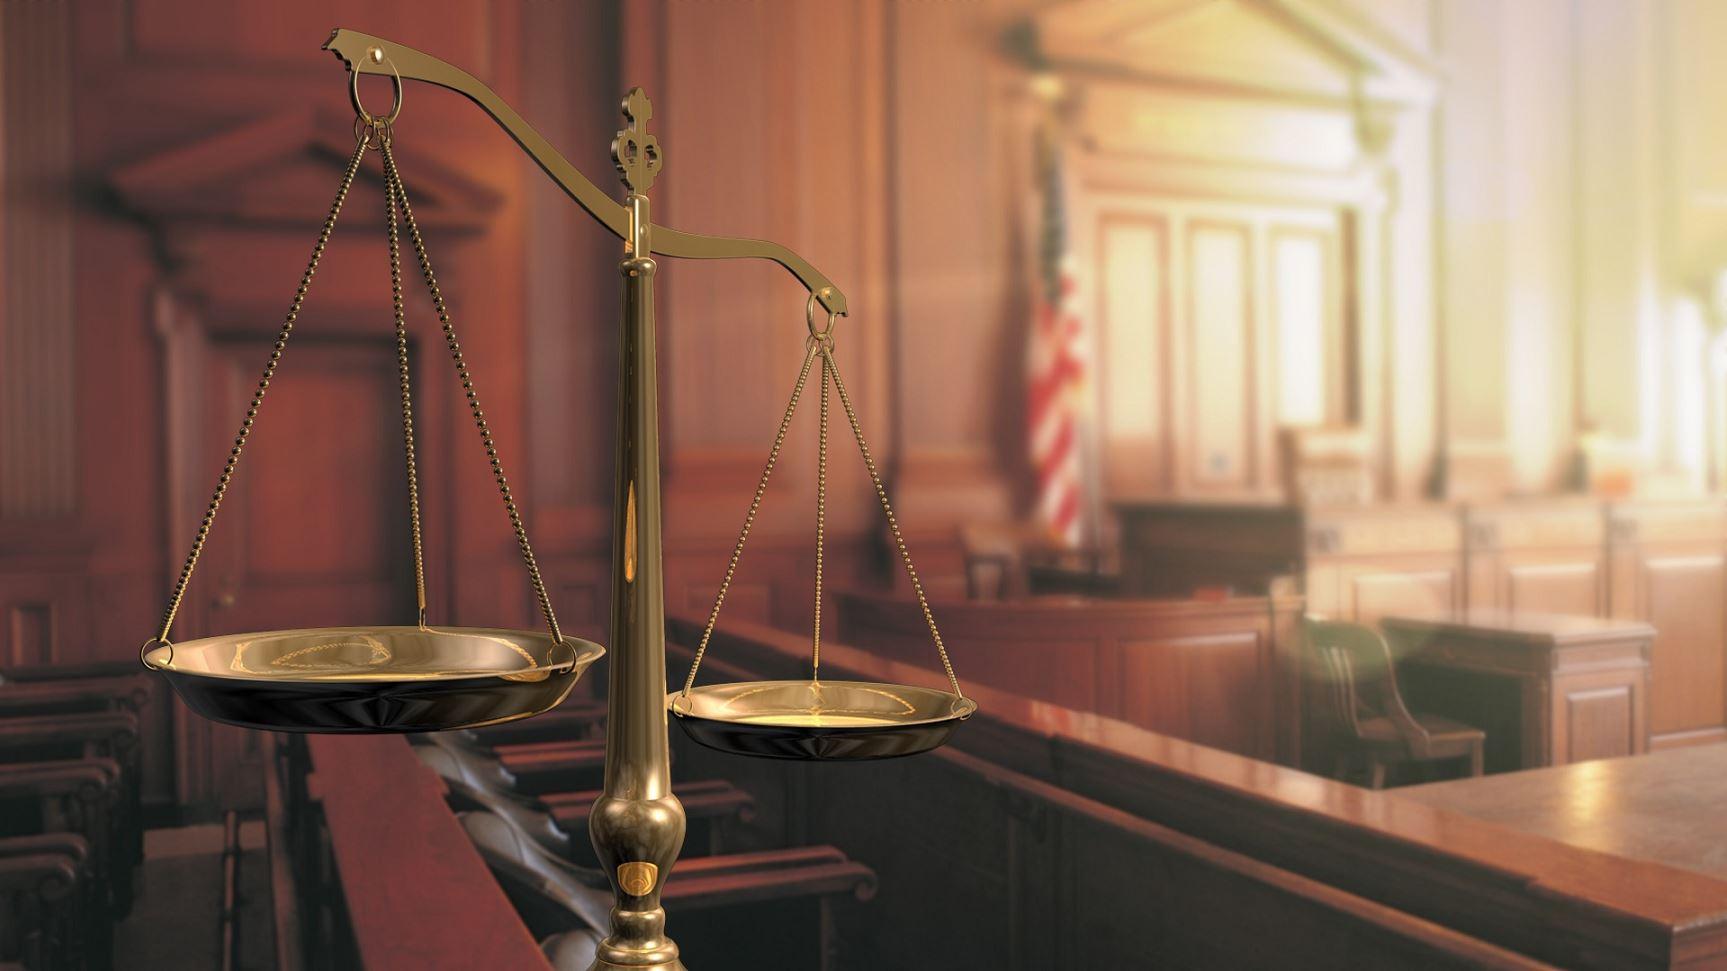 court in court generic_125634